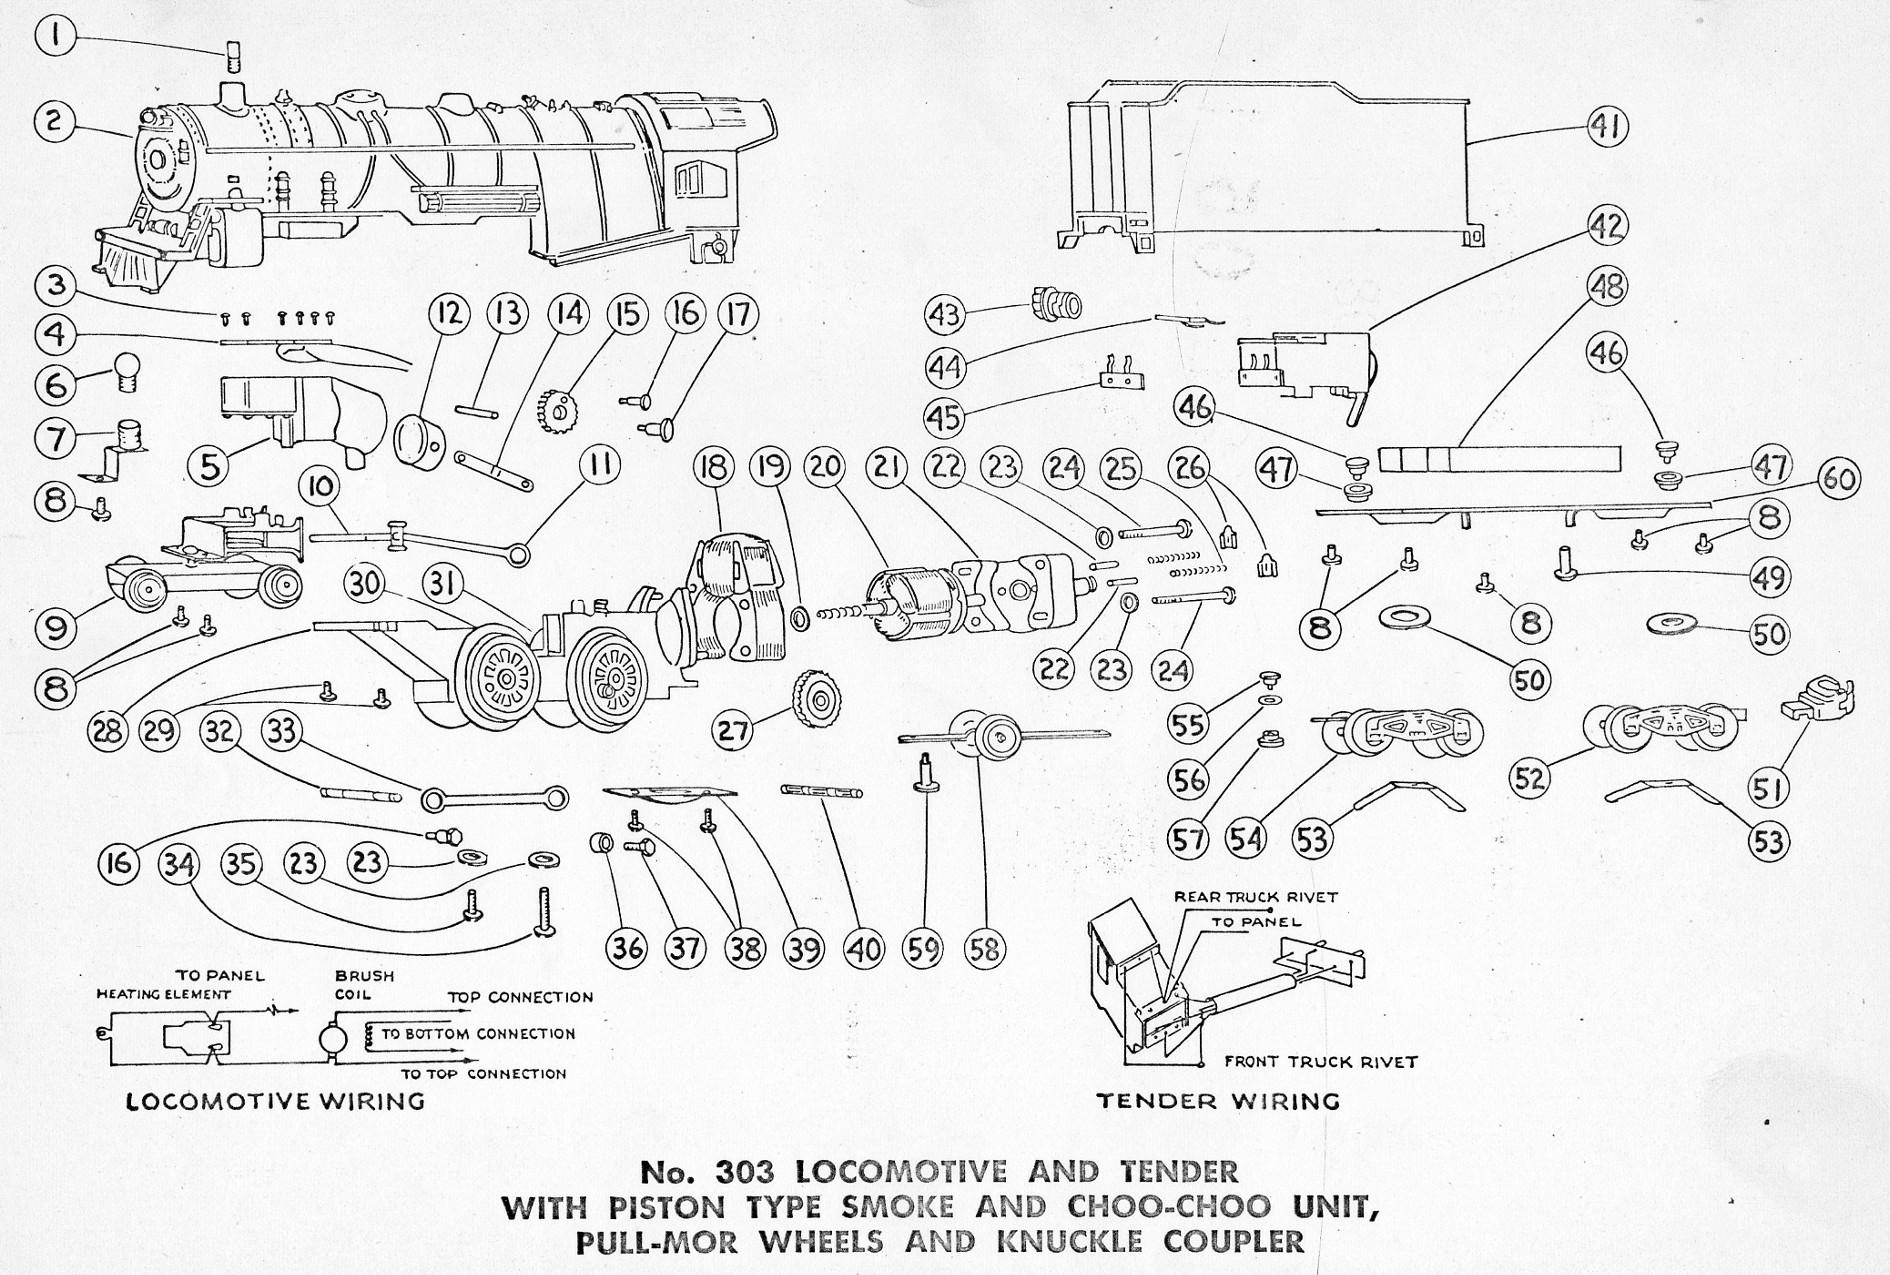 American Flyer Locomotive 308 Parts List Amp Diagram